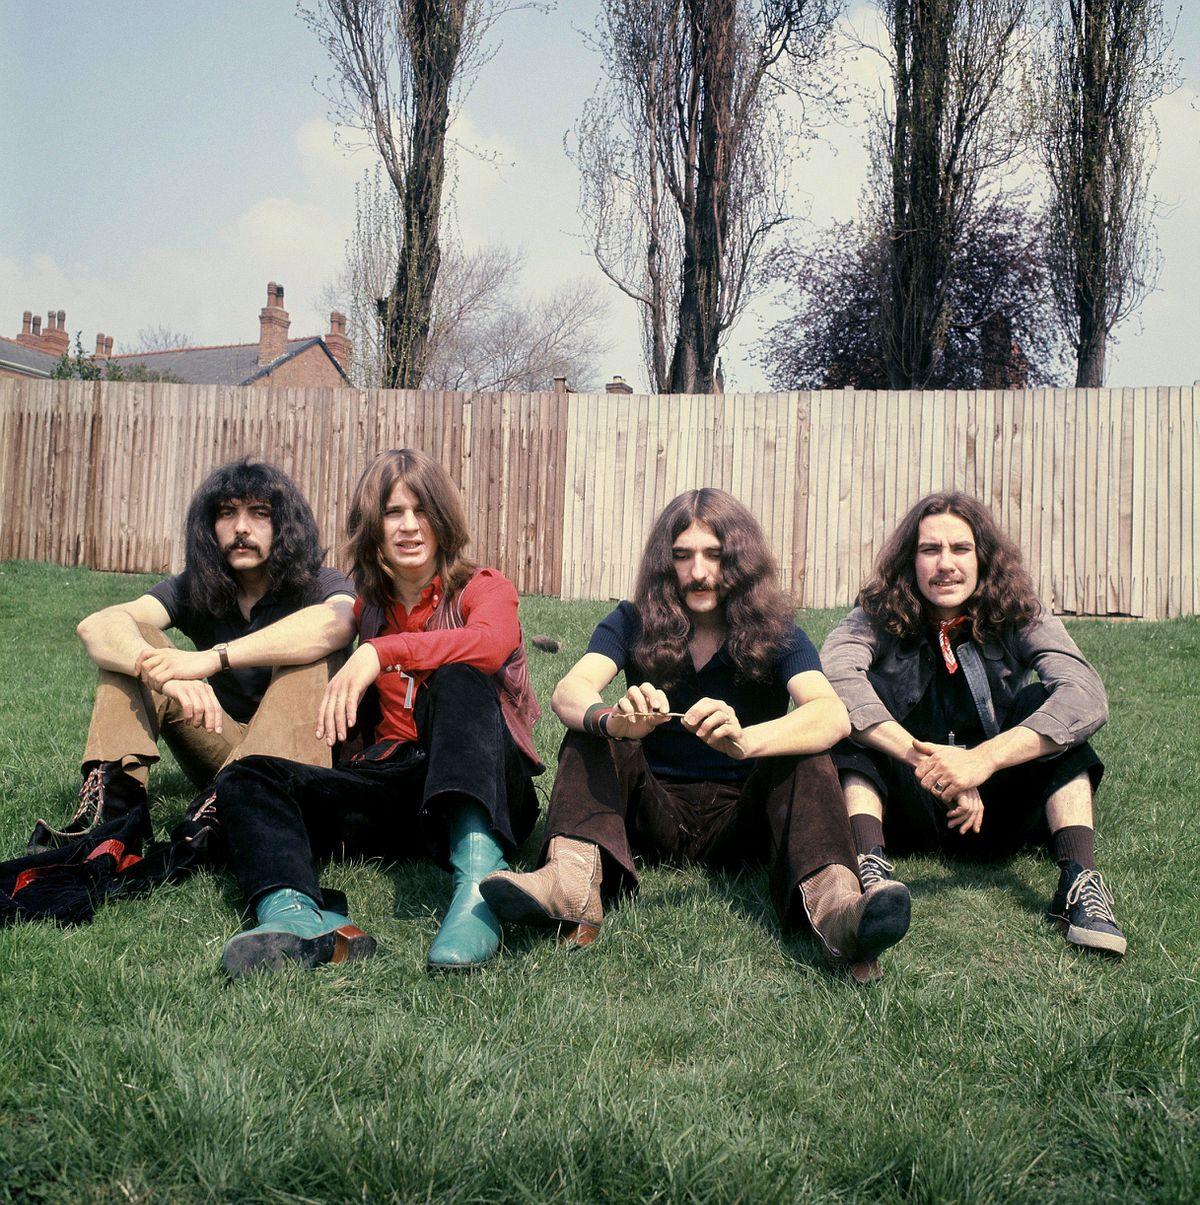 Black Sabbath during their early years outside Jim Simpson's home in Edgbaston Photo: Jim Simpson